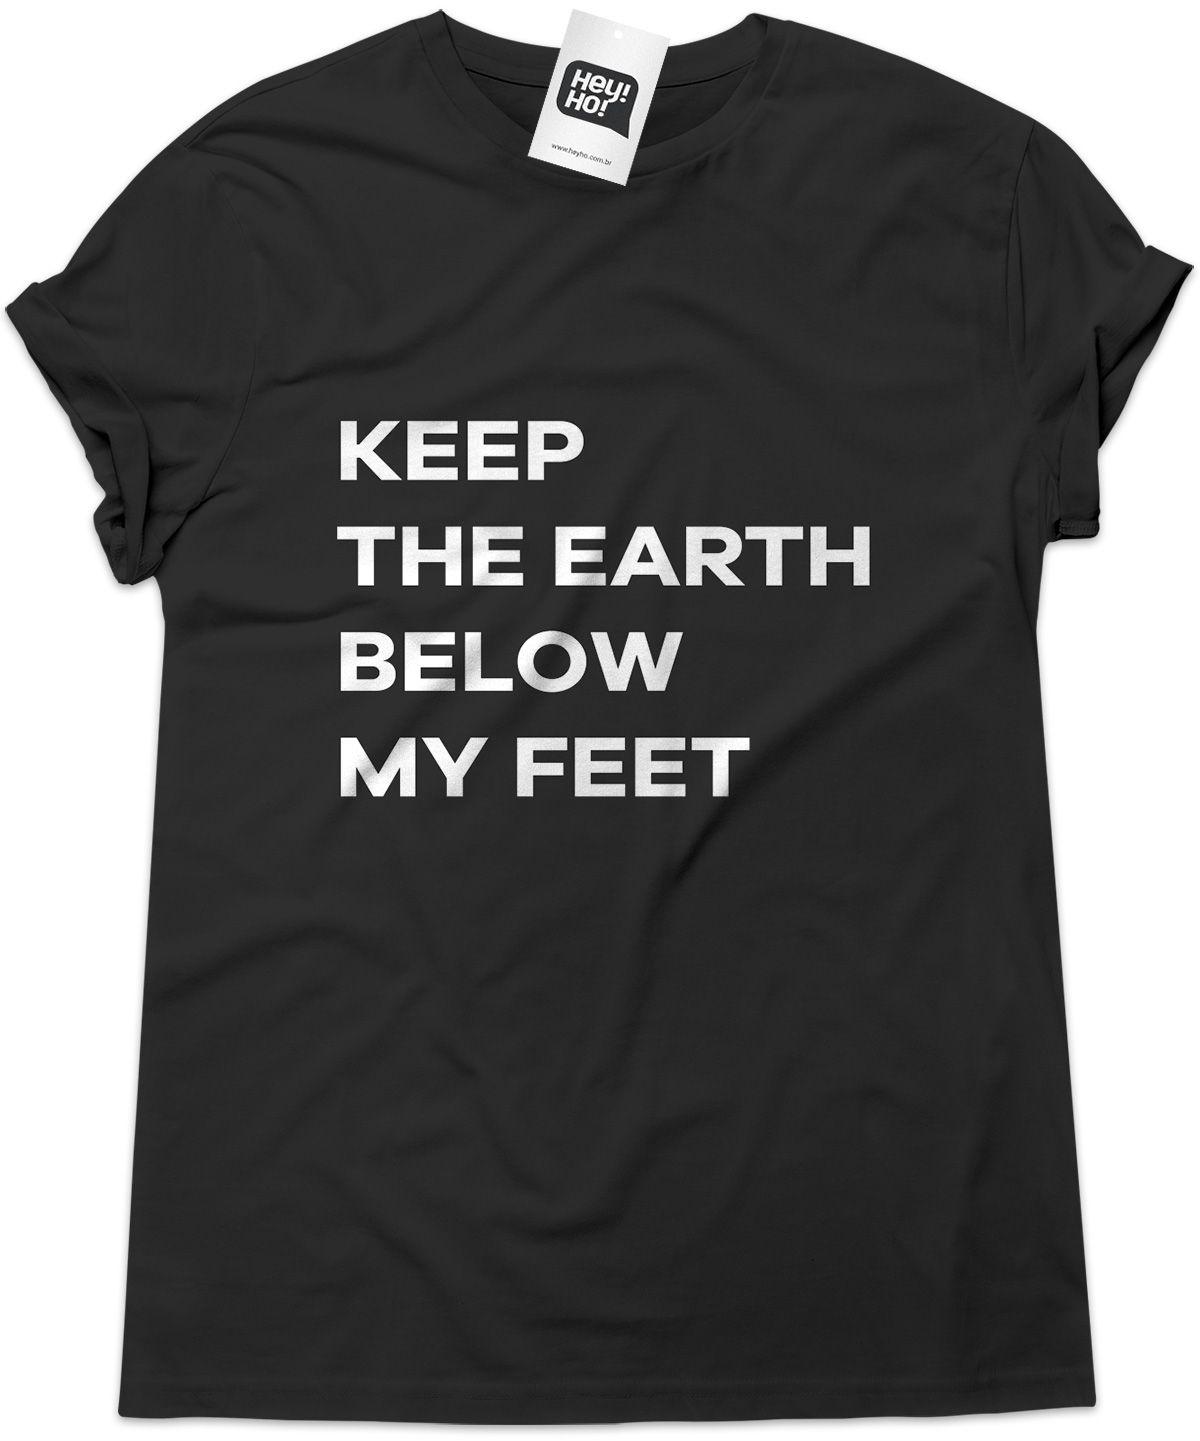 MUMFORD AND SONS - Below My Feet